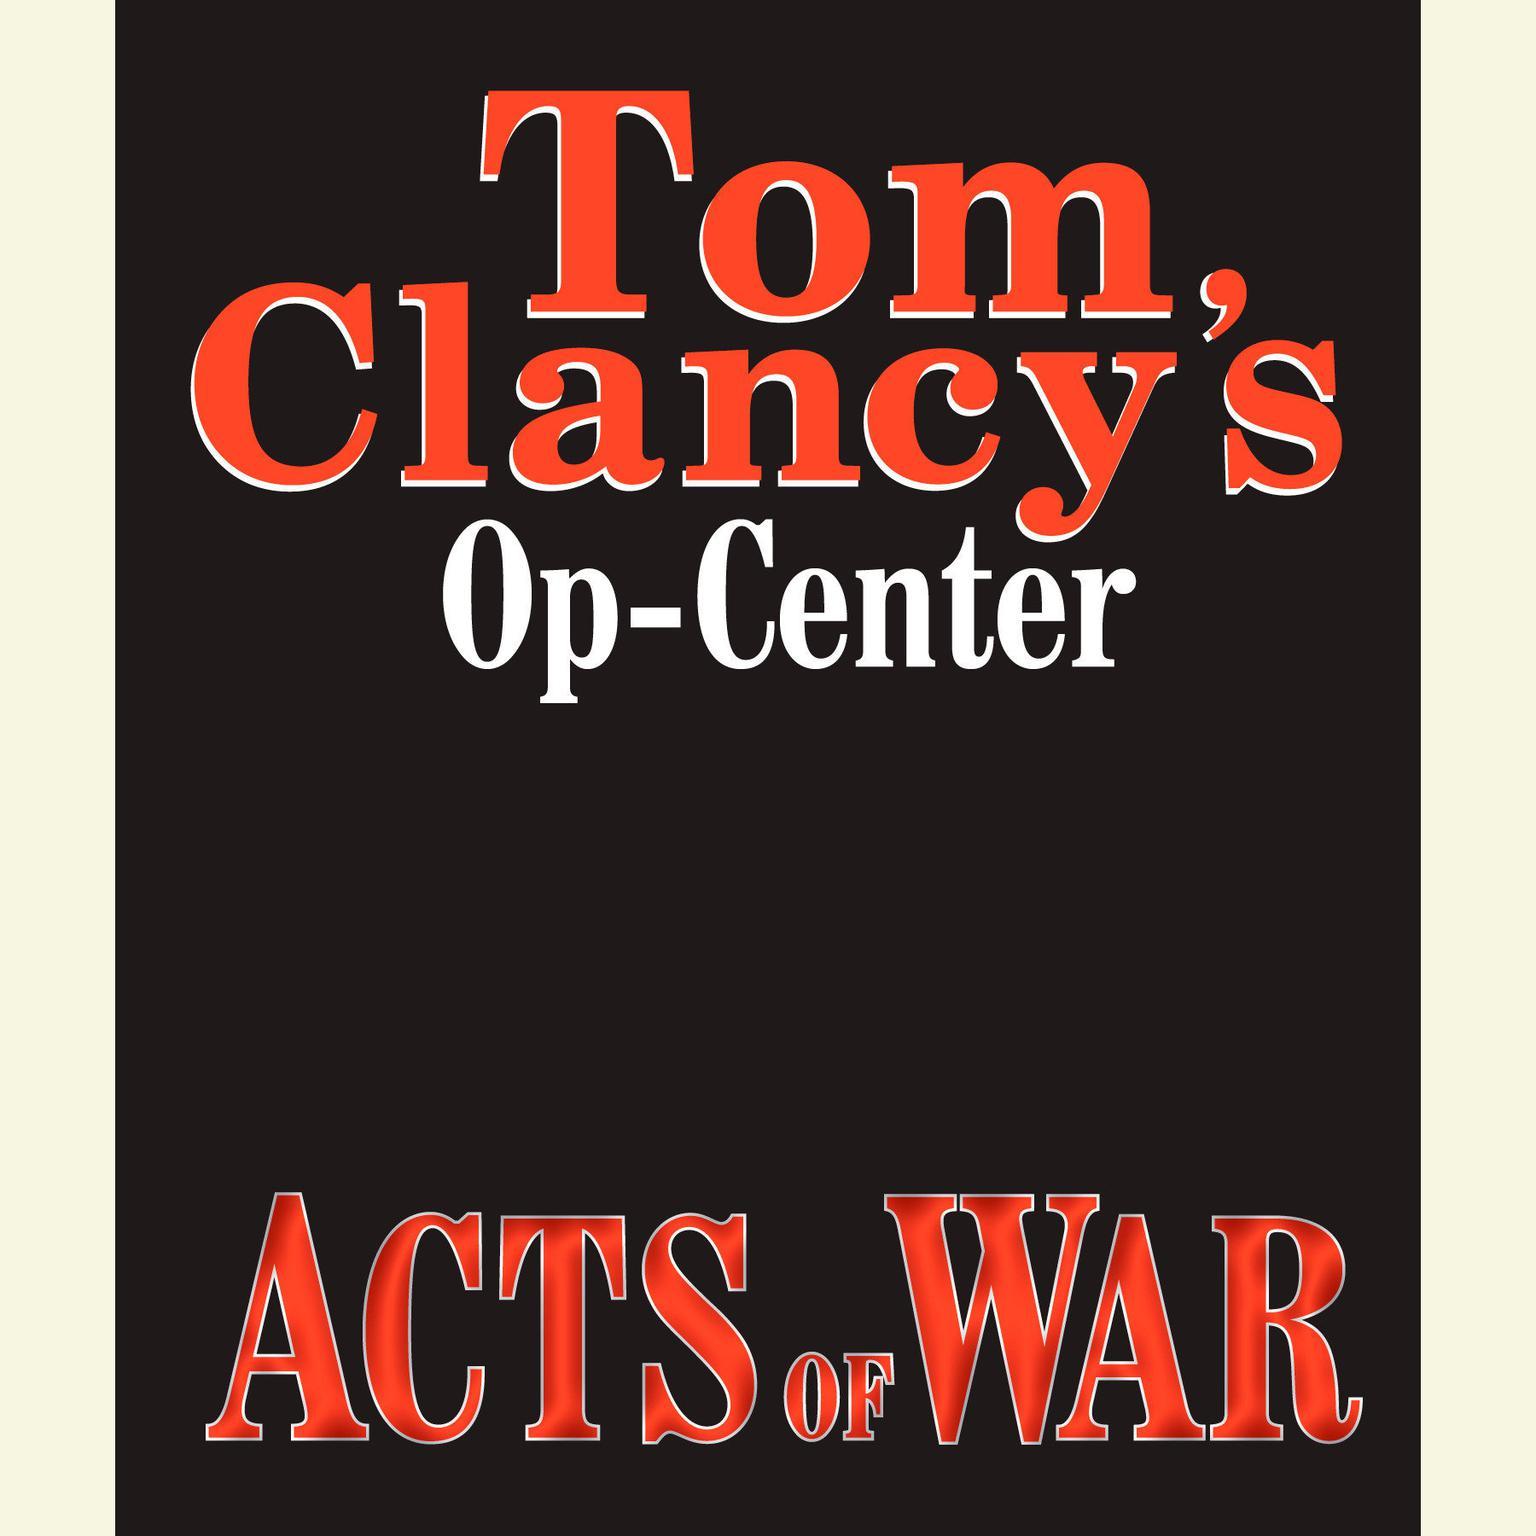 Printable Tom Clancy's Op-Center #4: Acts of War Audiobook Cover Art